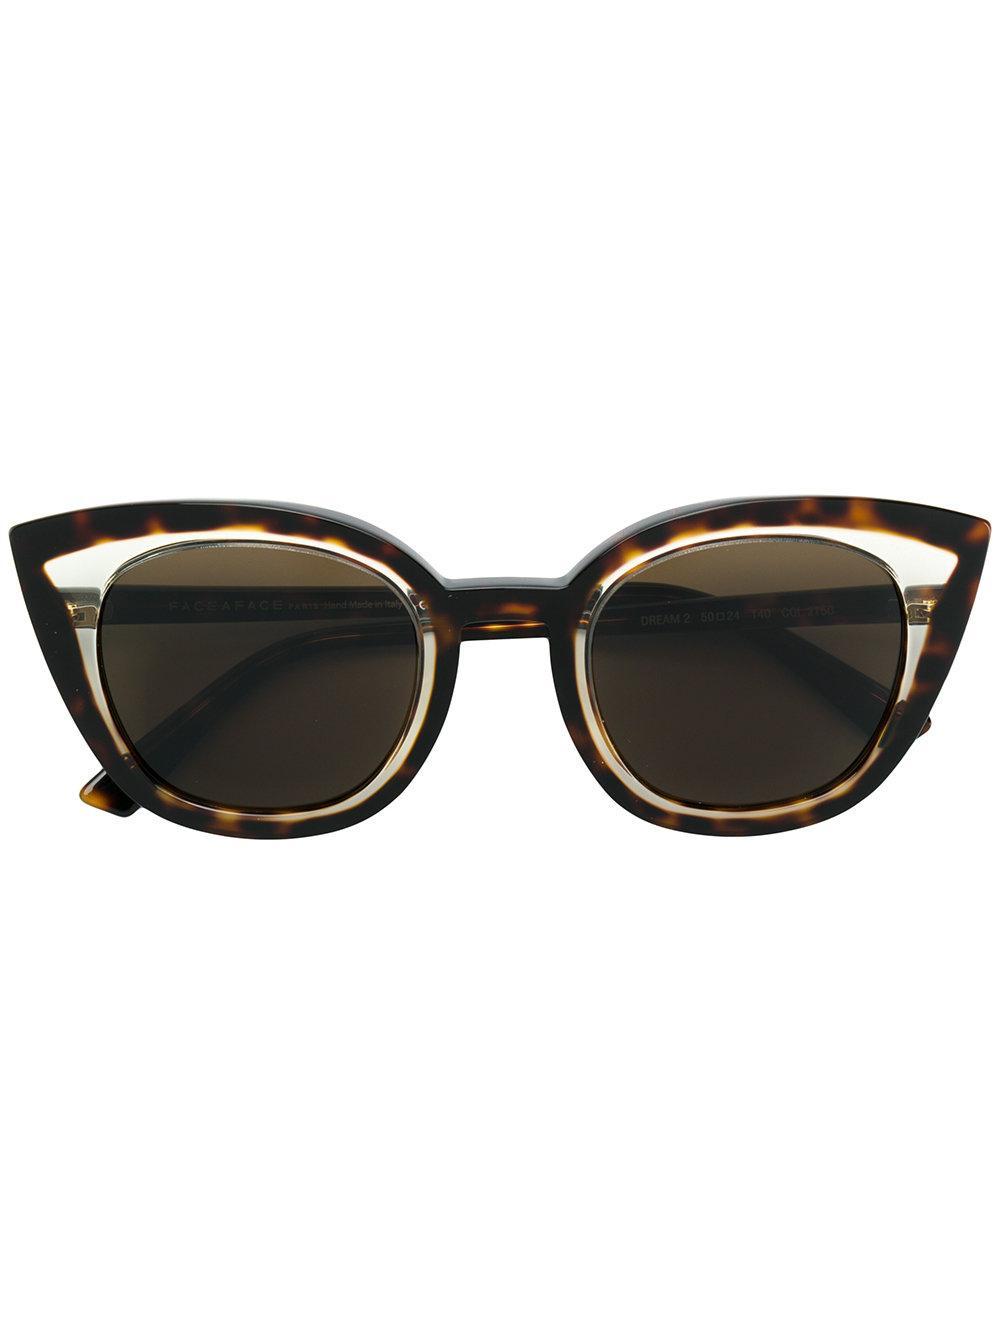 bf1087f226f Face À Face Tortoiseshell Cat-Eye Sunglasses - Farfetch In 2150 ...